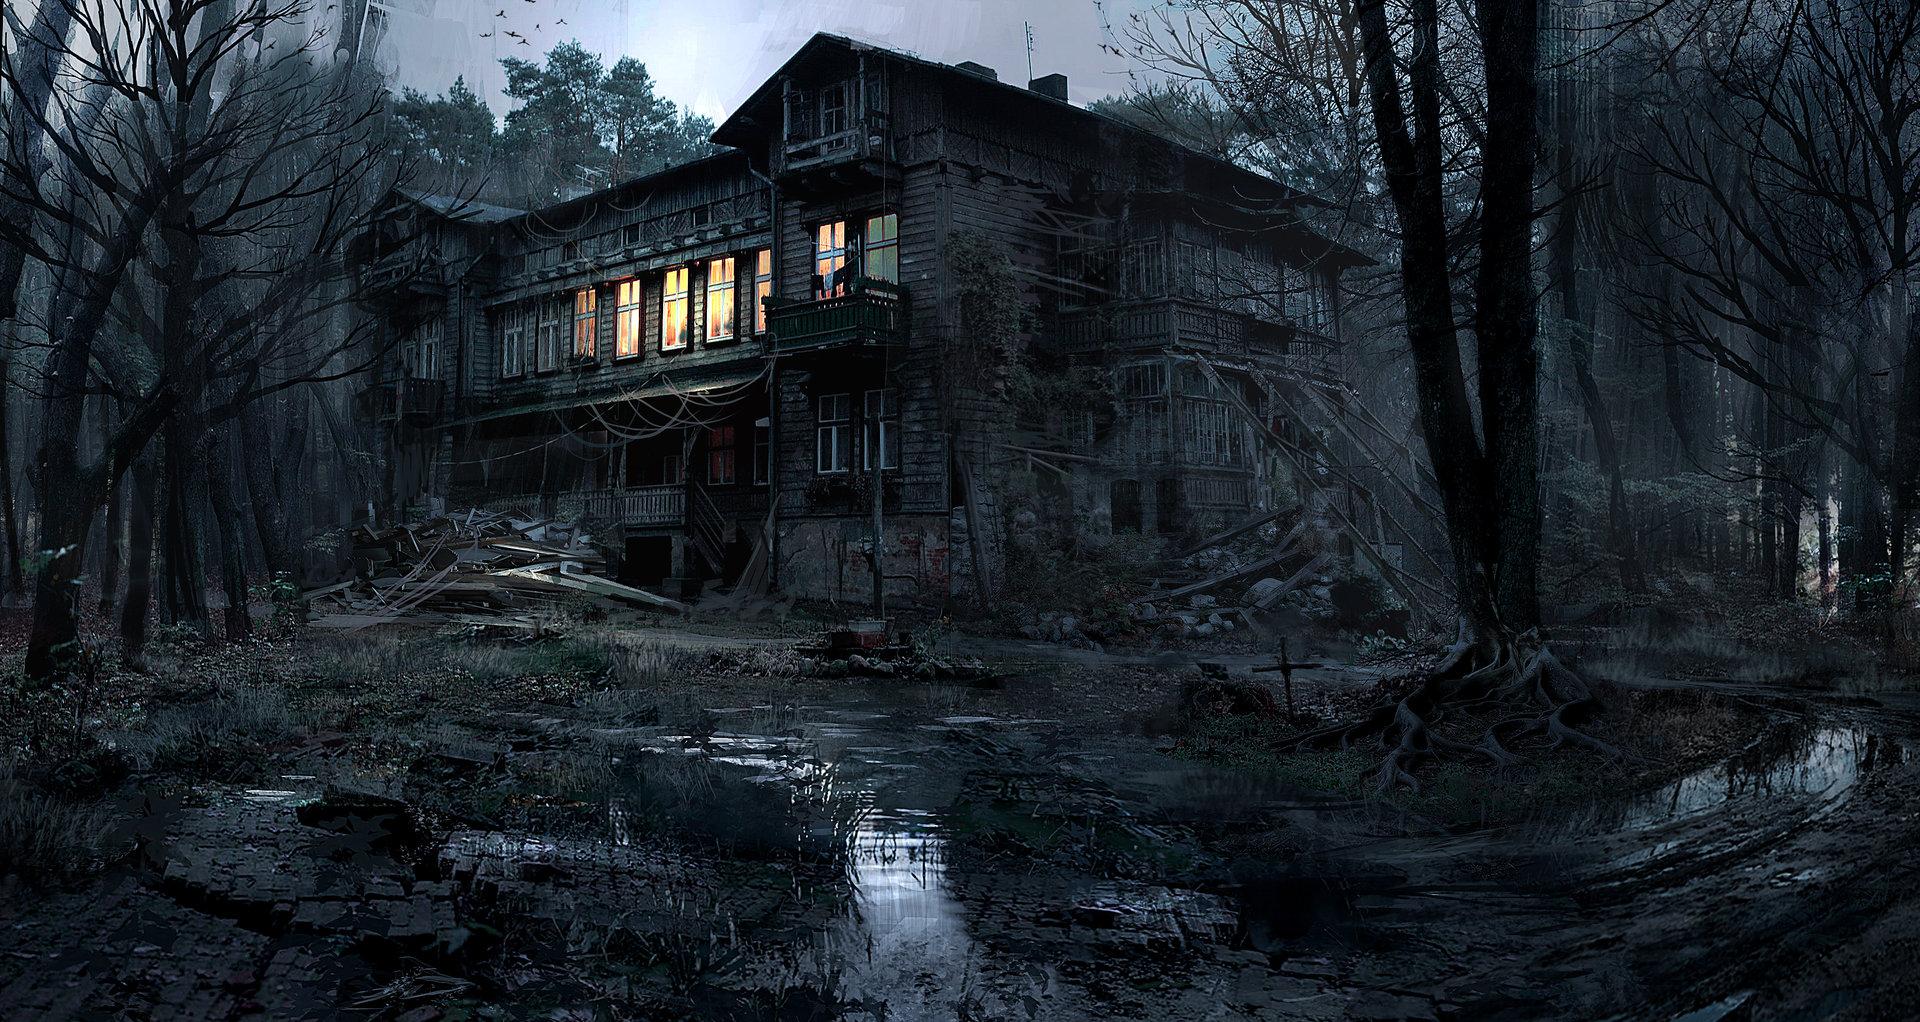 Klaus wittmann cabin22222